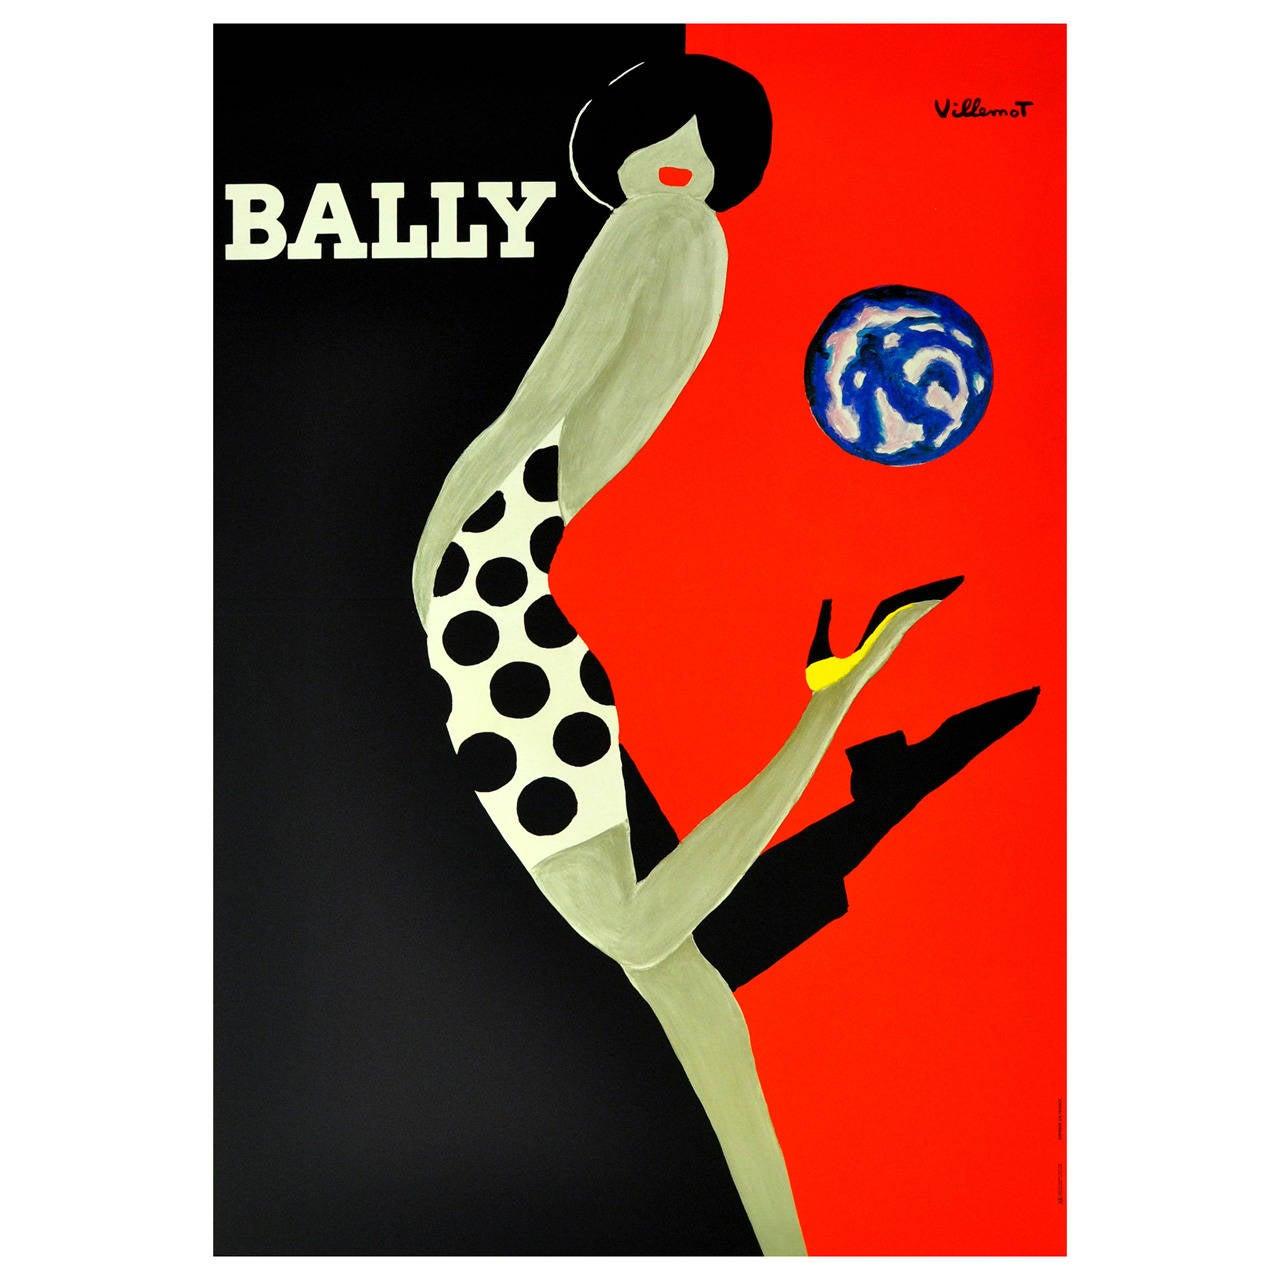 Bally Ball, Original Vintage Bally Shoes Advertising Poster by Bernard Villemot